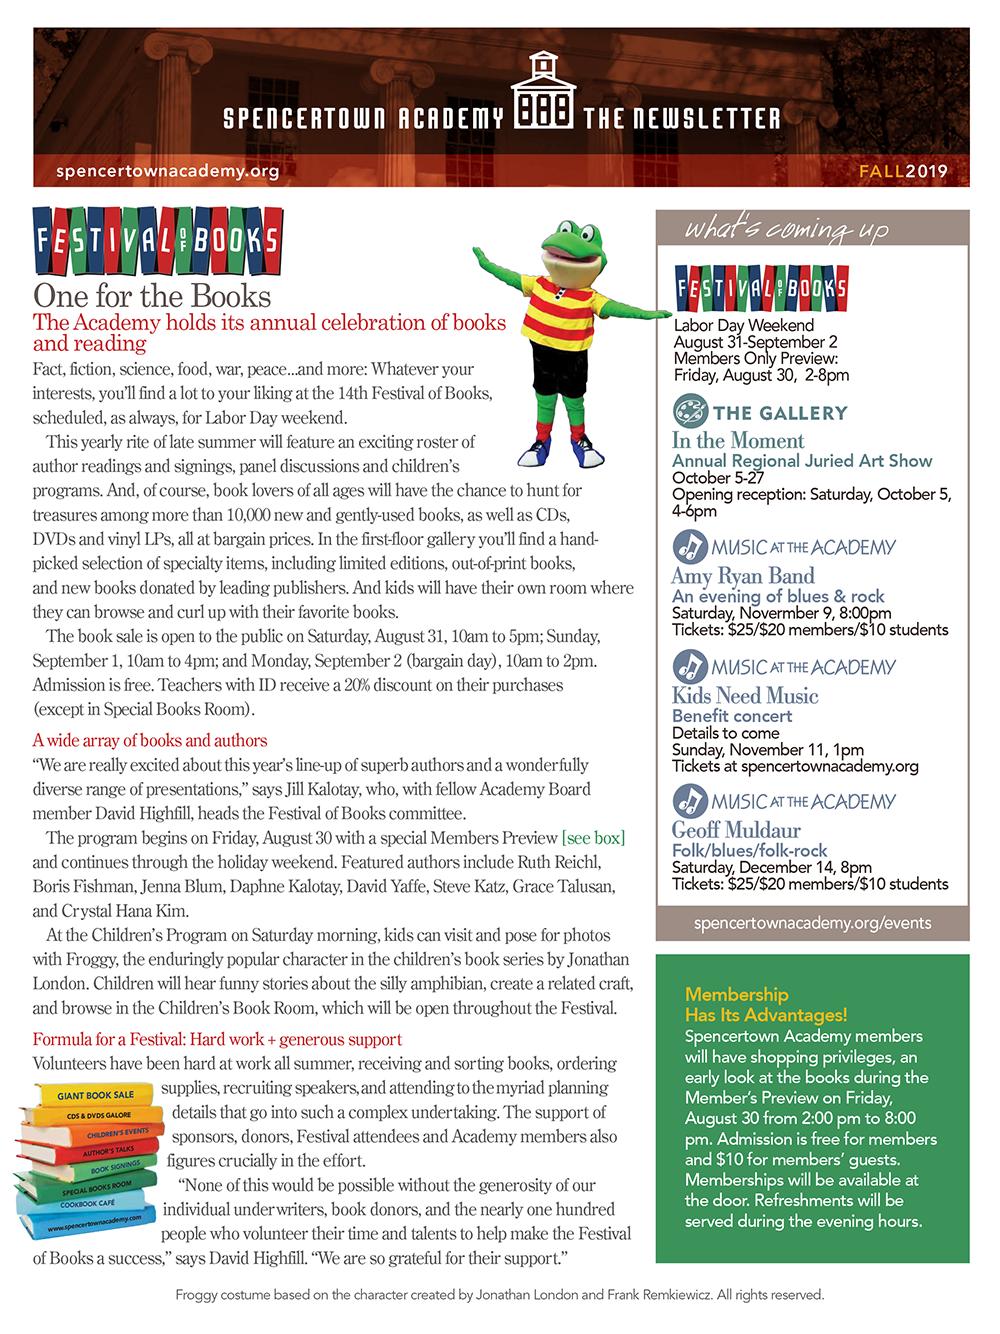 Spencertown Academy Fall 2019 Newsletter Cover